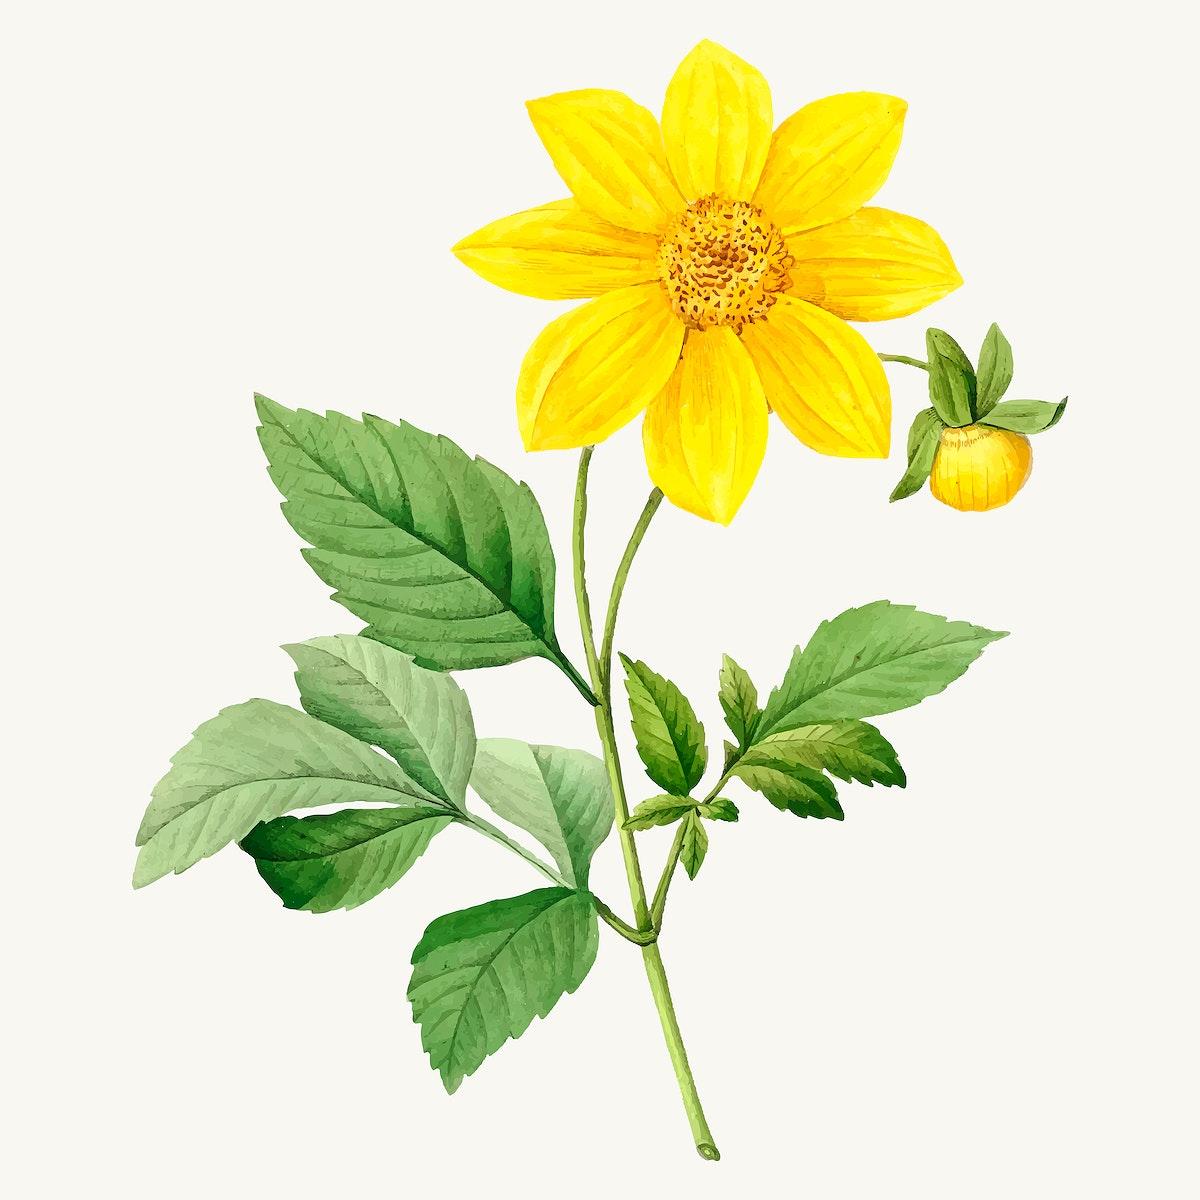 Dahlia flower botanical illustration vector, remixed from artworks by Pierre-Joseph Redouté